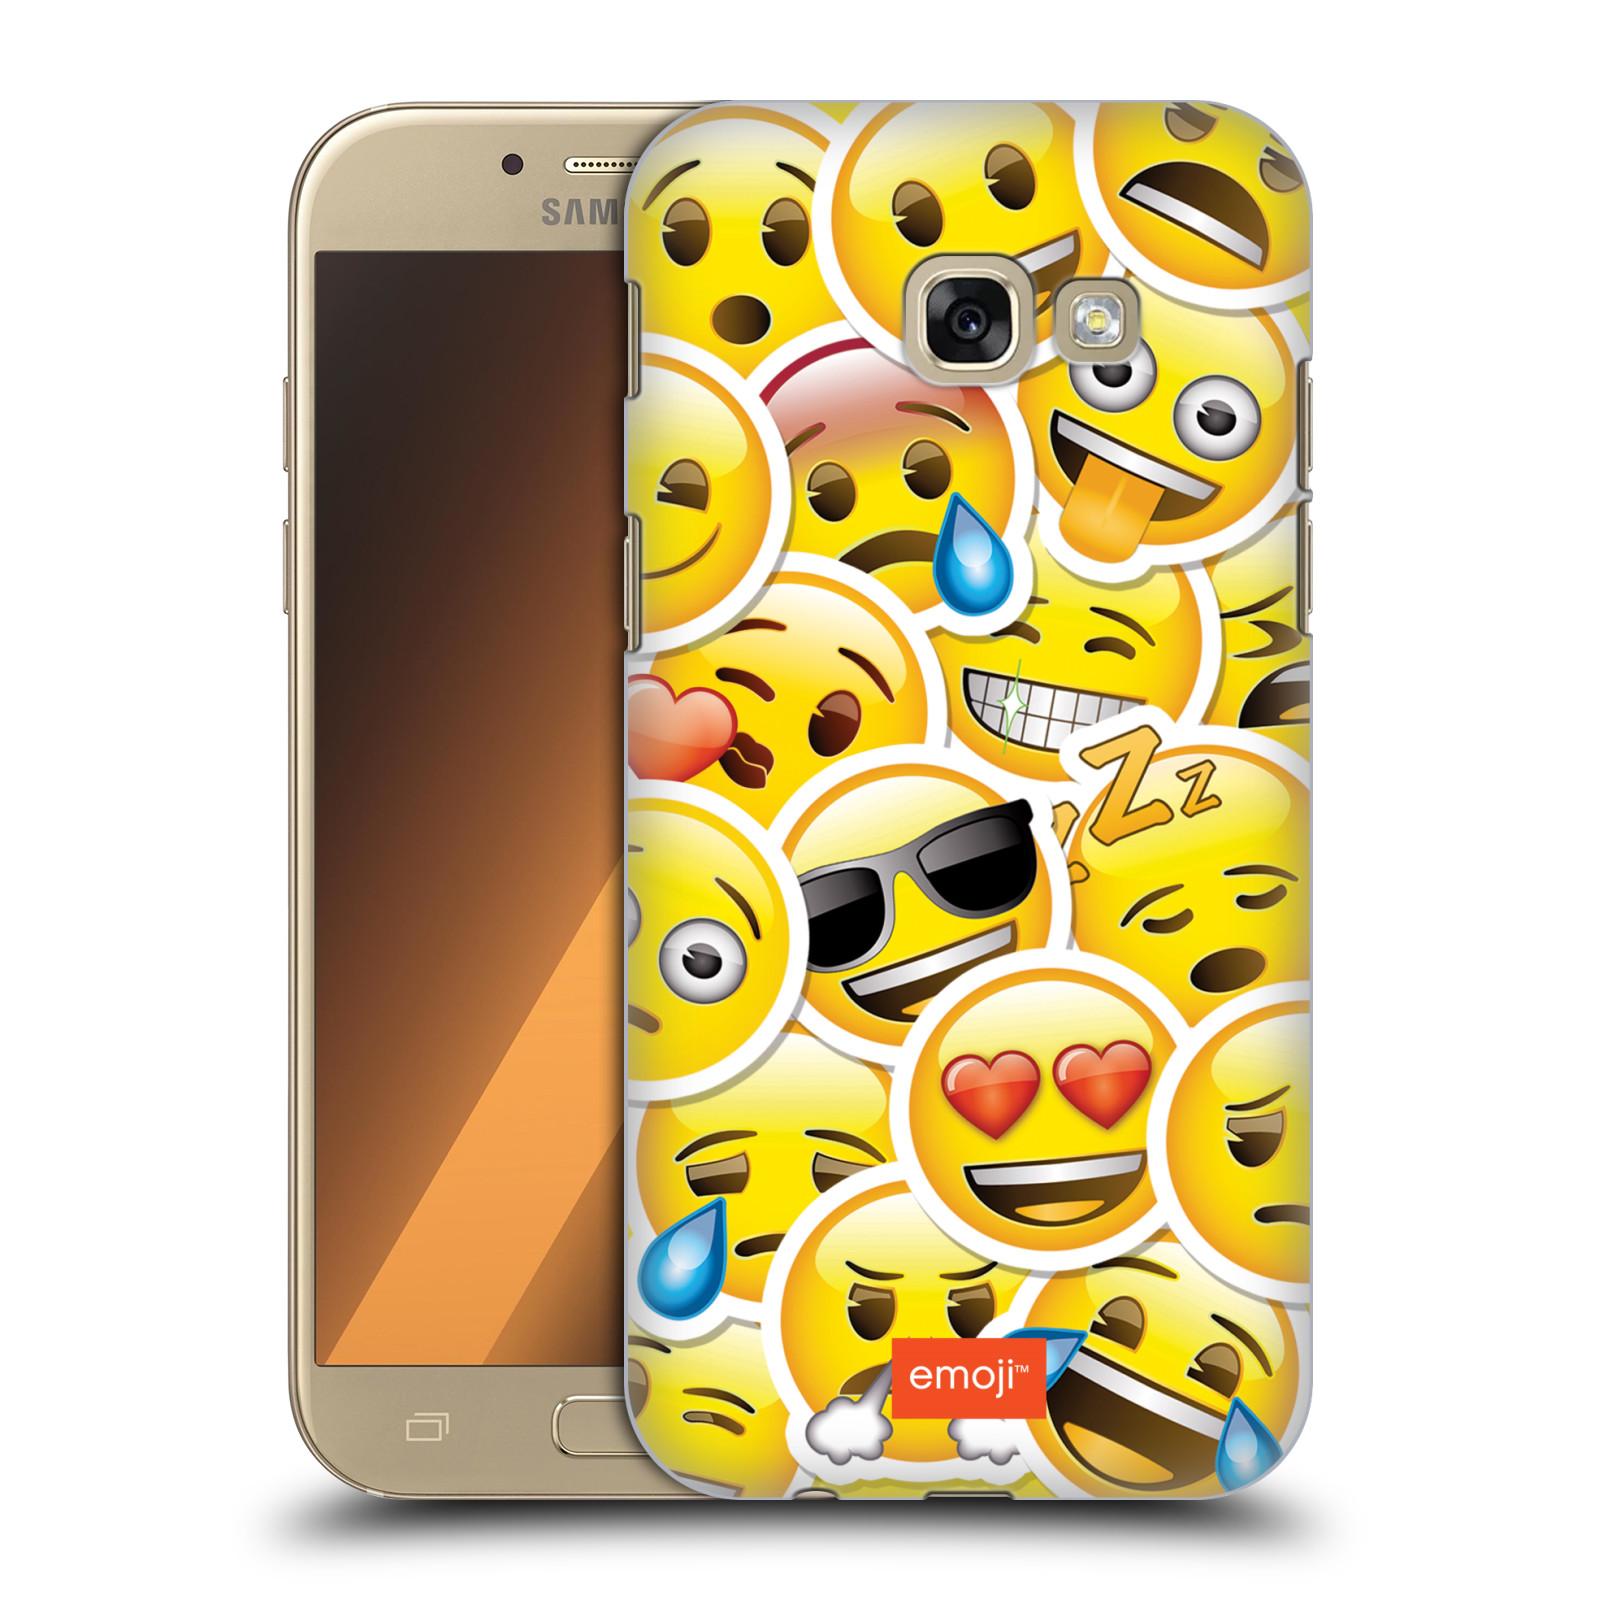 Plastové pouzdro na mobil Samsung Galaxy A5 (2017) HEAD CASE EMOJI - Velcí smajlíci ZZ